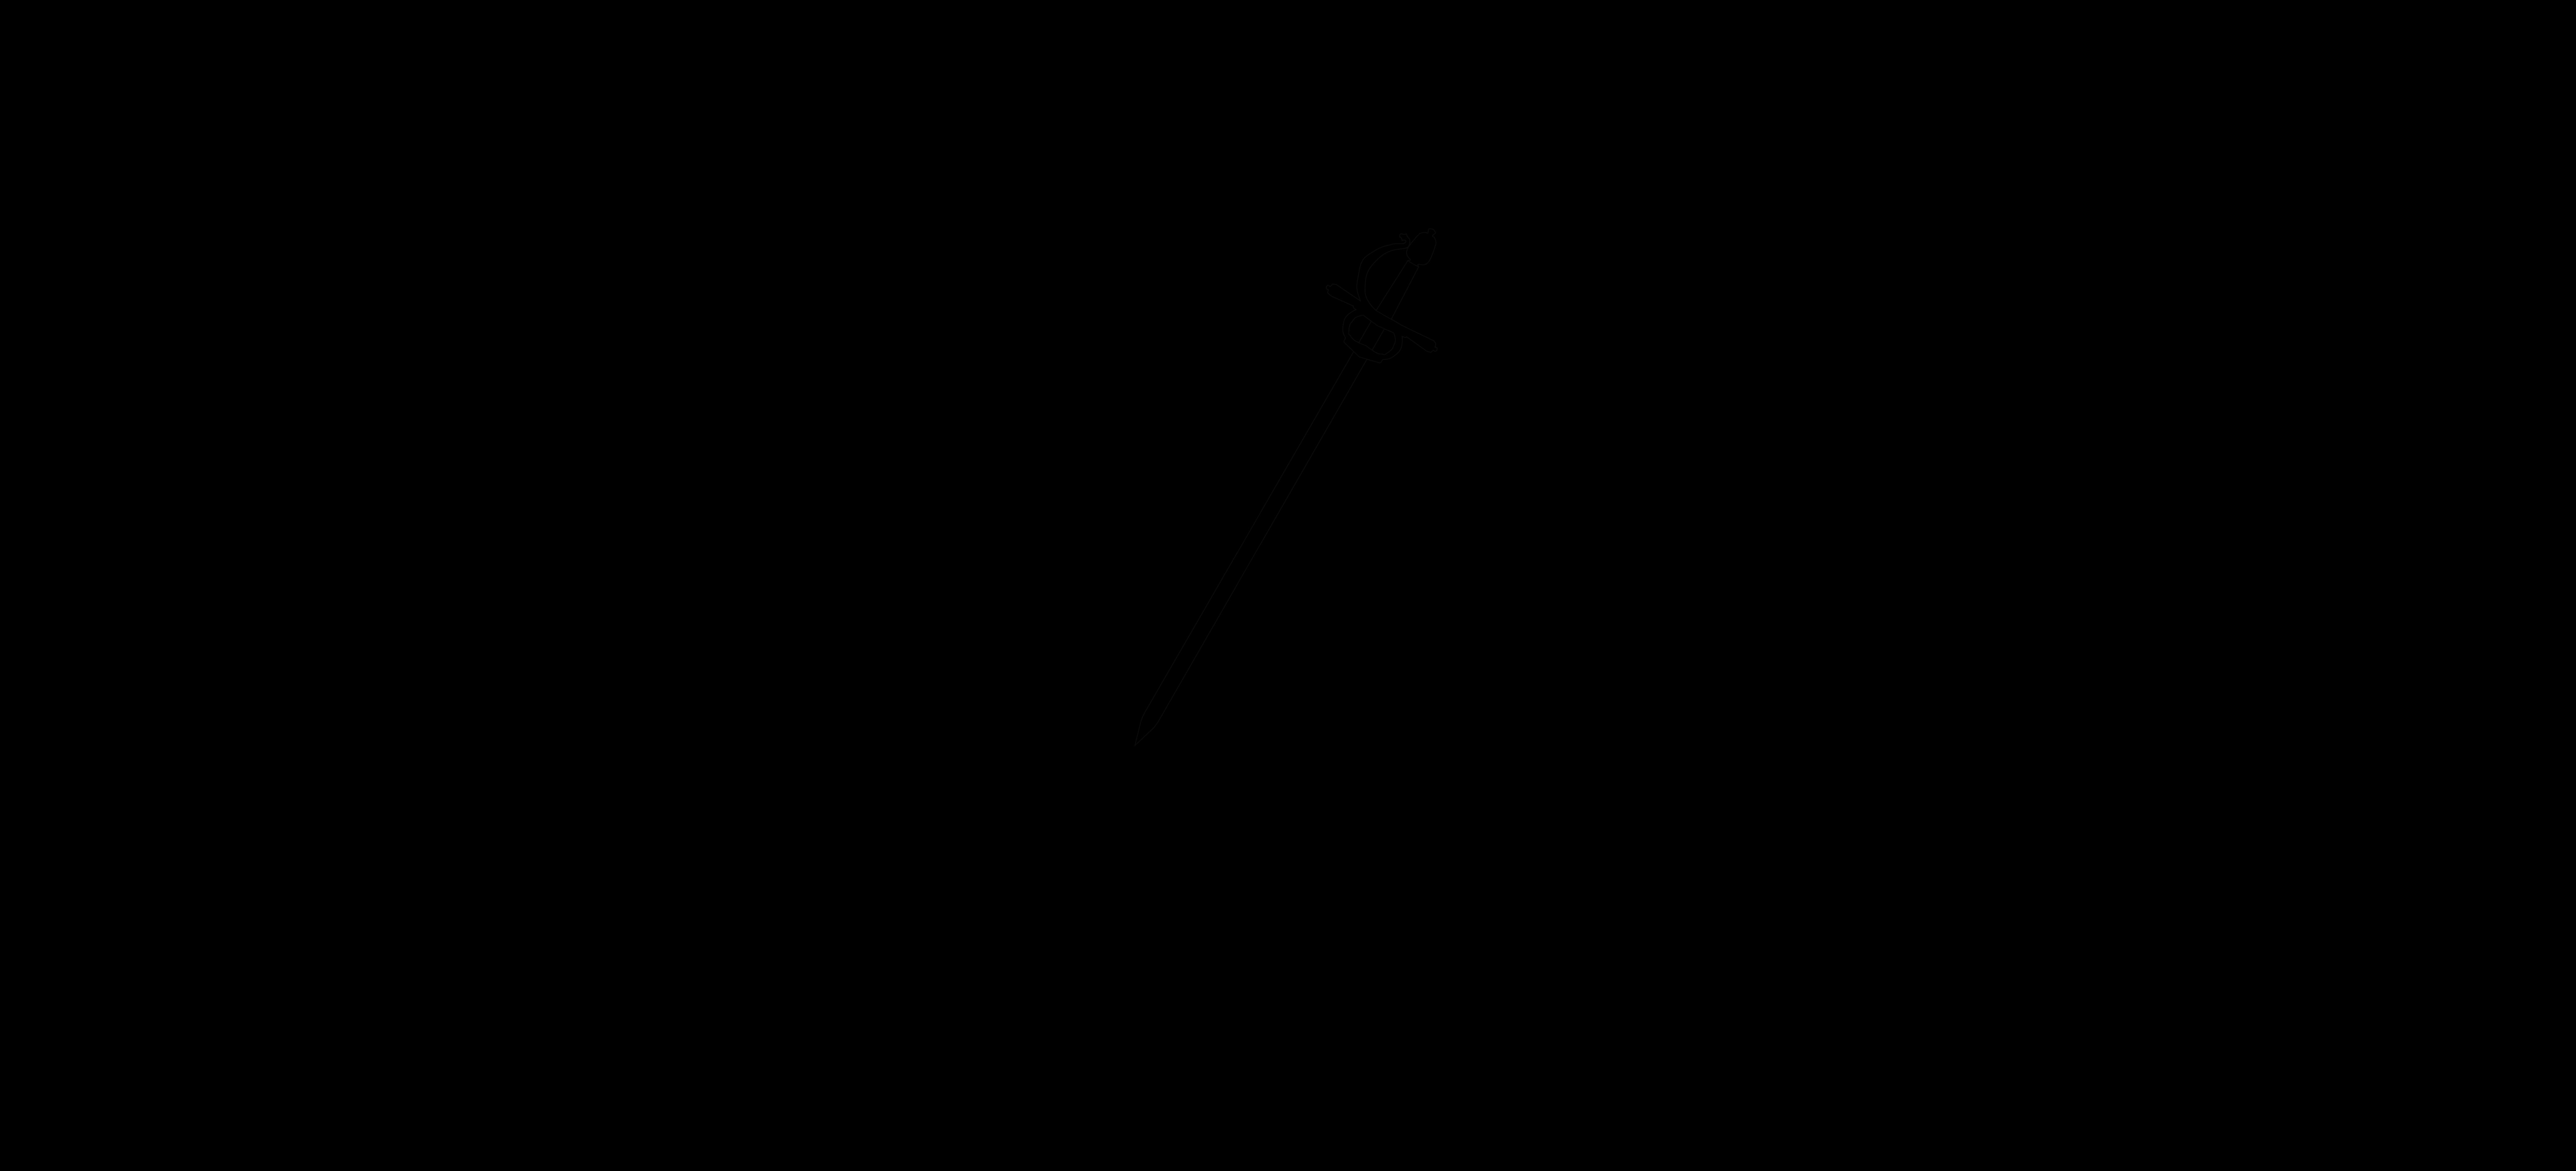 Duellatorum